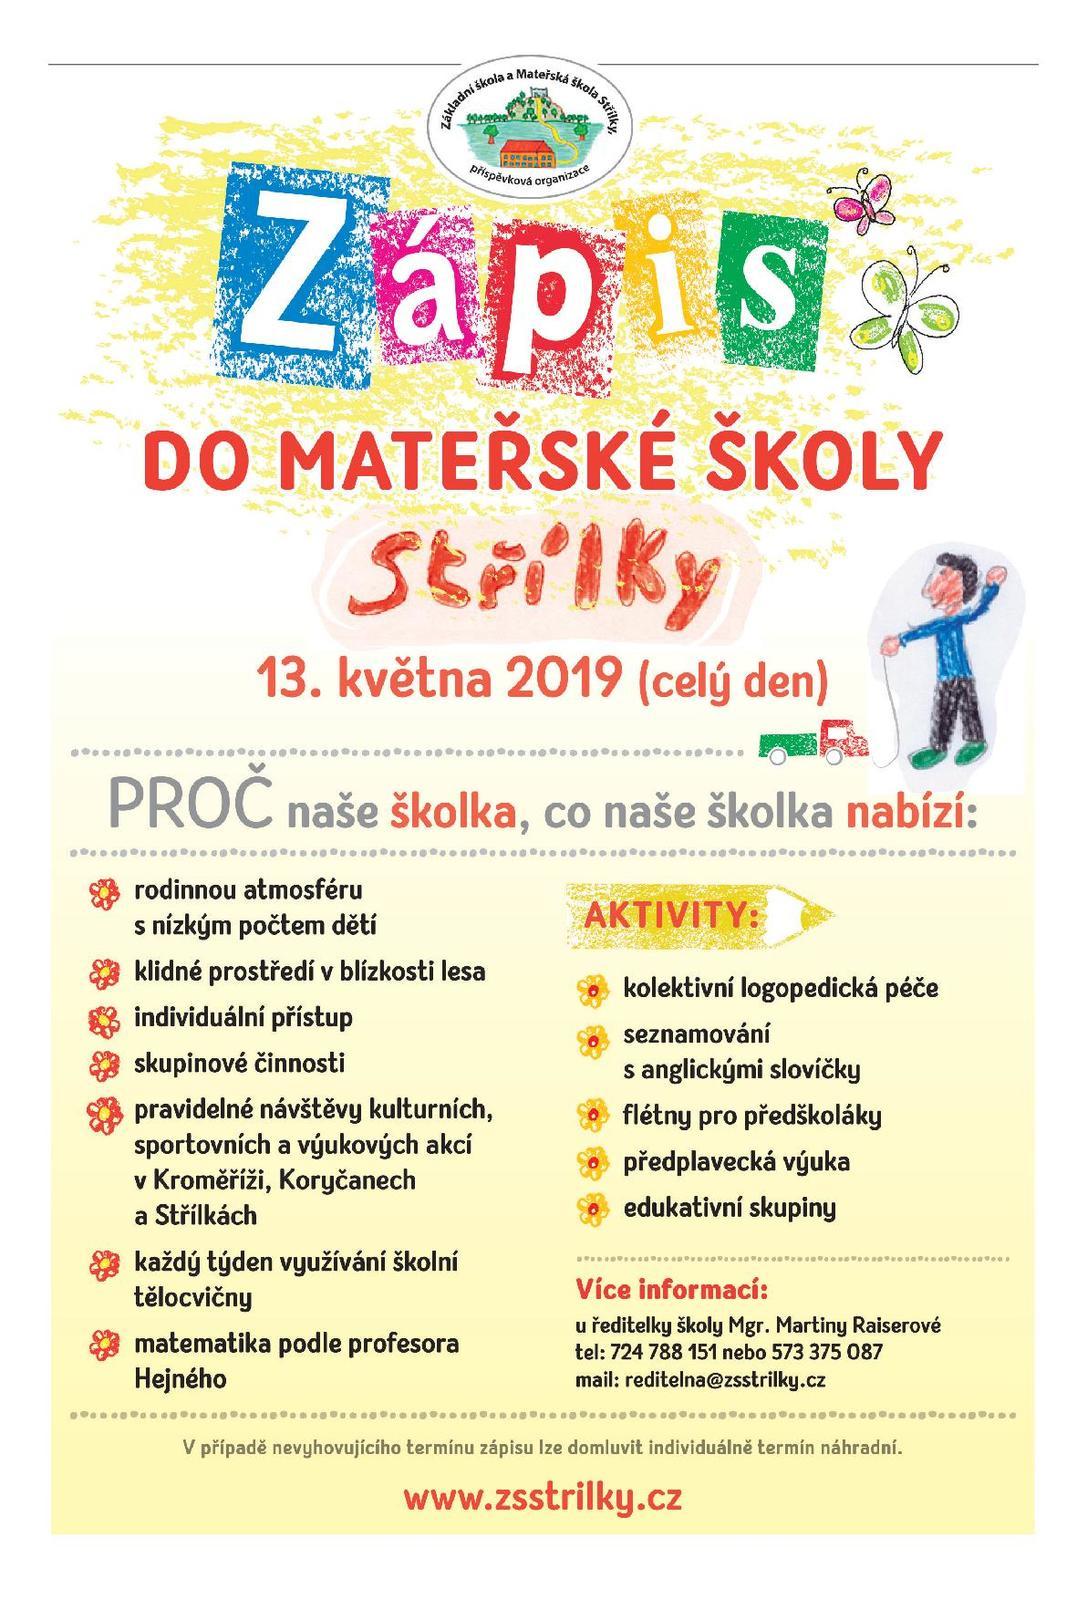 duben 2016 Ronk 14/slo 2/zdarma - obec Zdounky